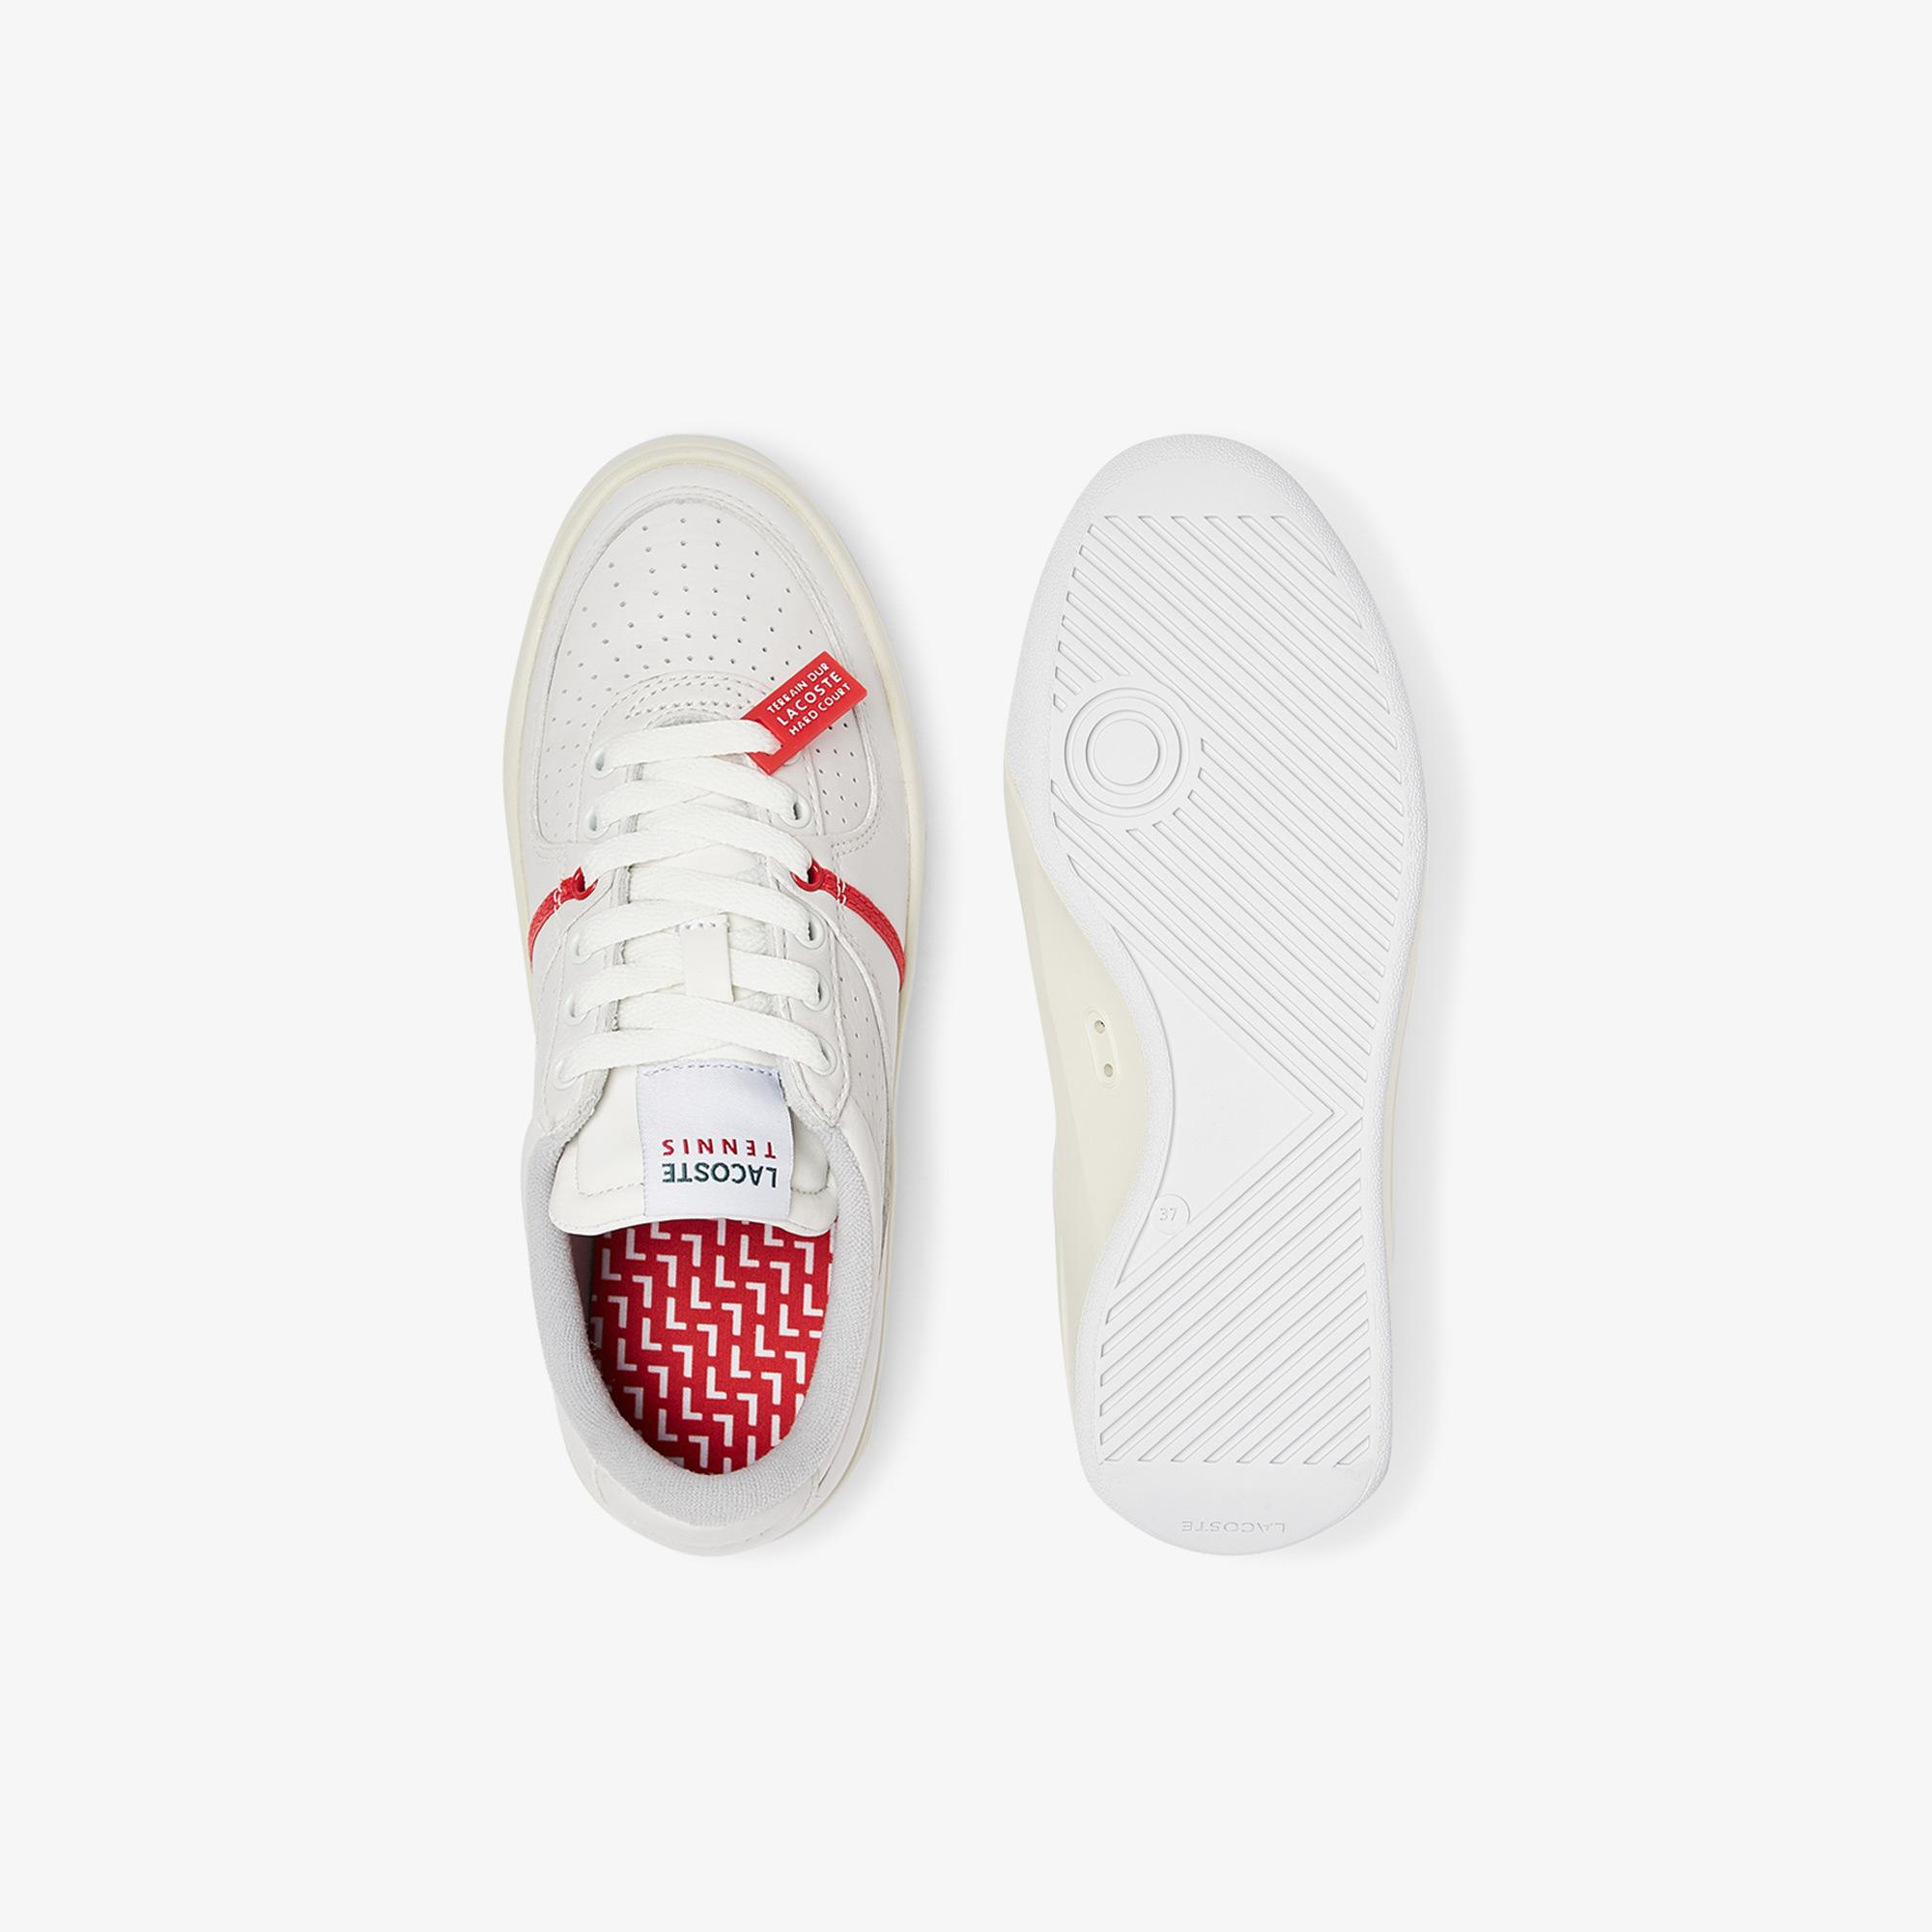 Lacoste Damskie buty Quantace 0721 1 Sfa